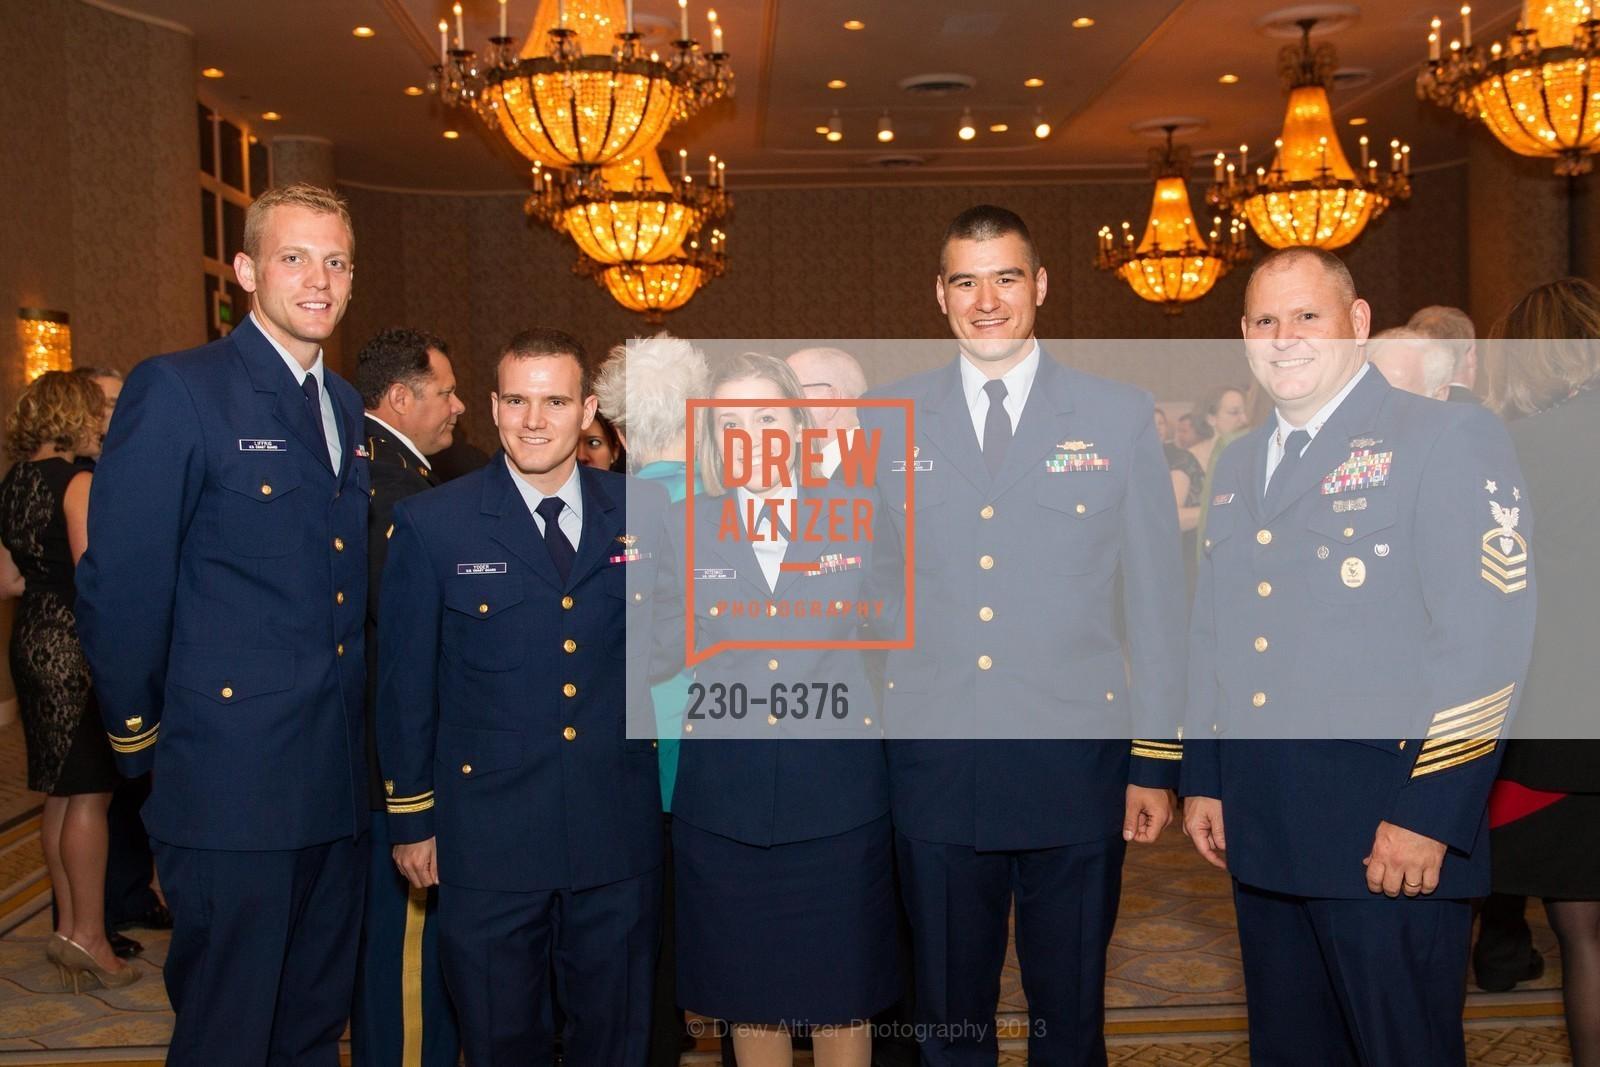 Joseph Liffrig, Rory Yoder, Noelle Kitenko, JG Joshua Kitenko, Rob Bushey, Photo #230-6376